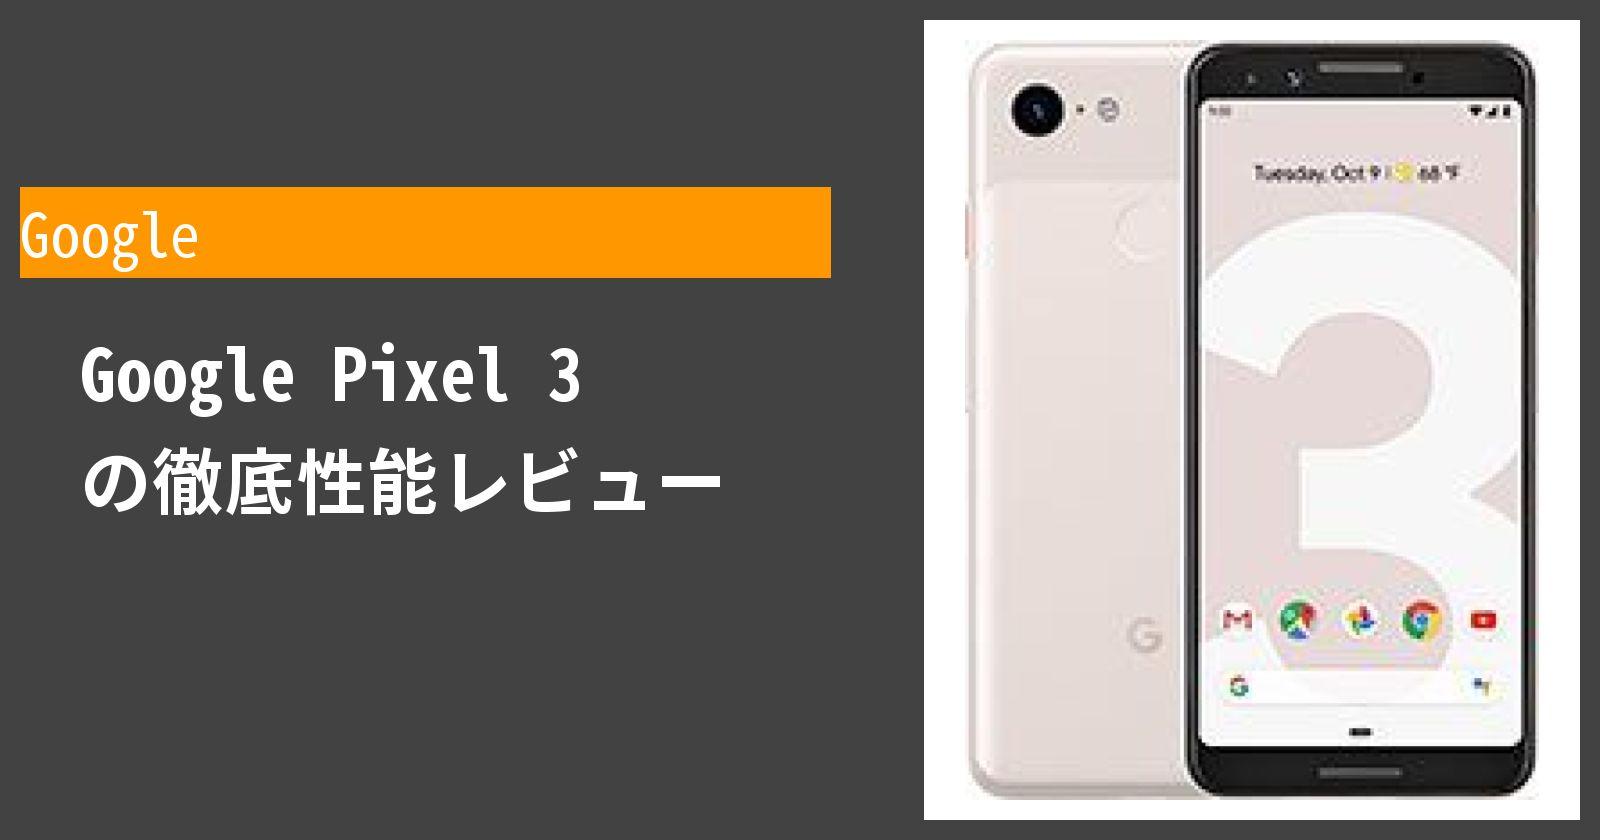 Google Pixel 3 の徹底性能レビュー